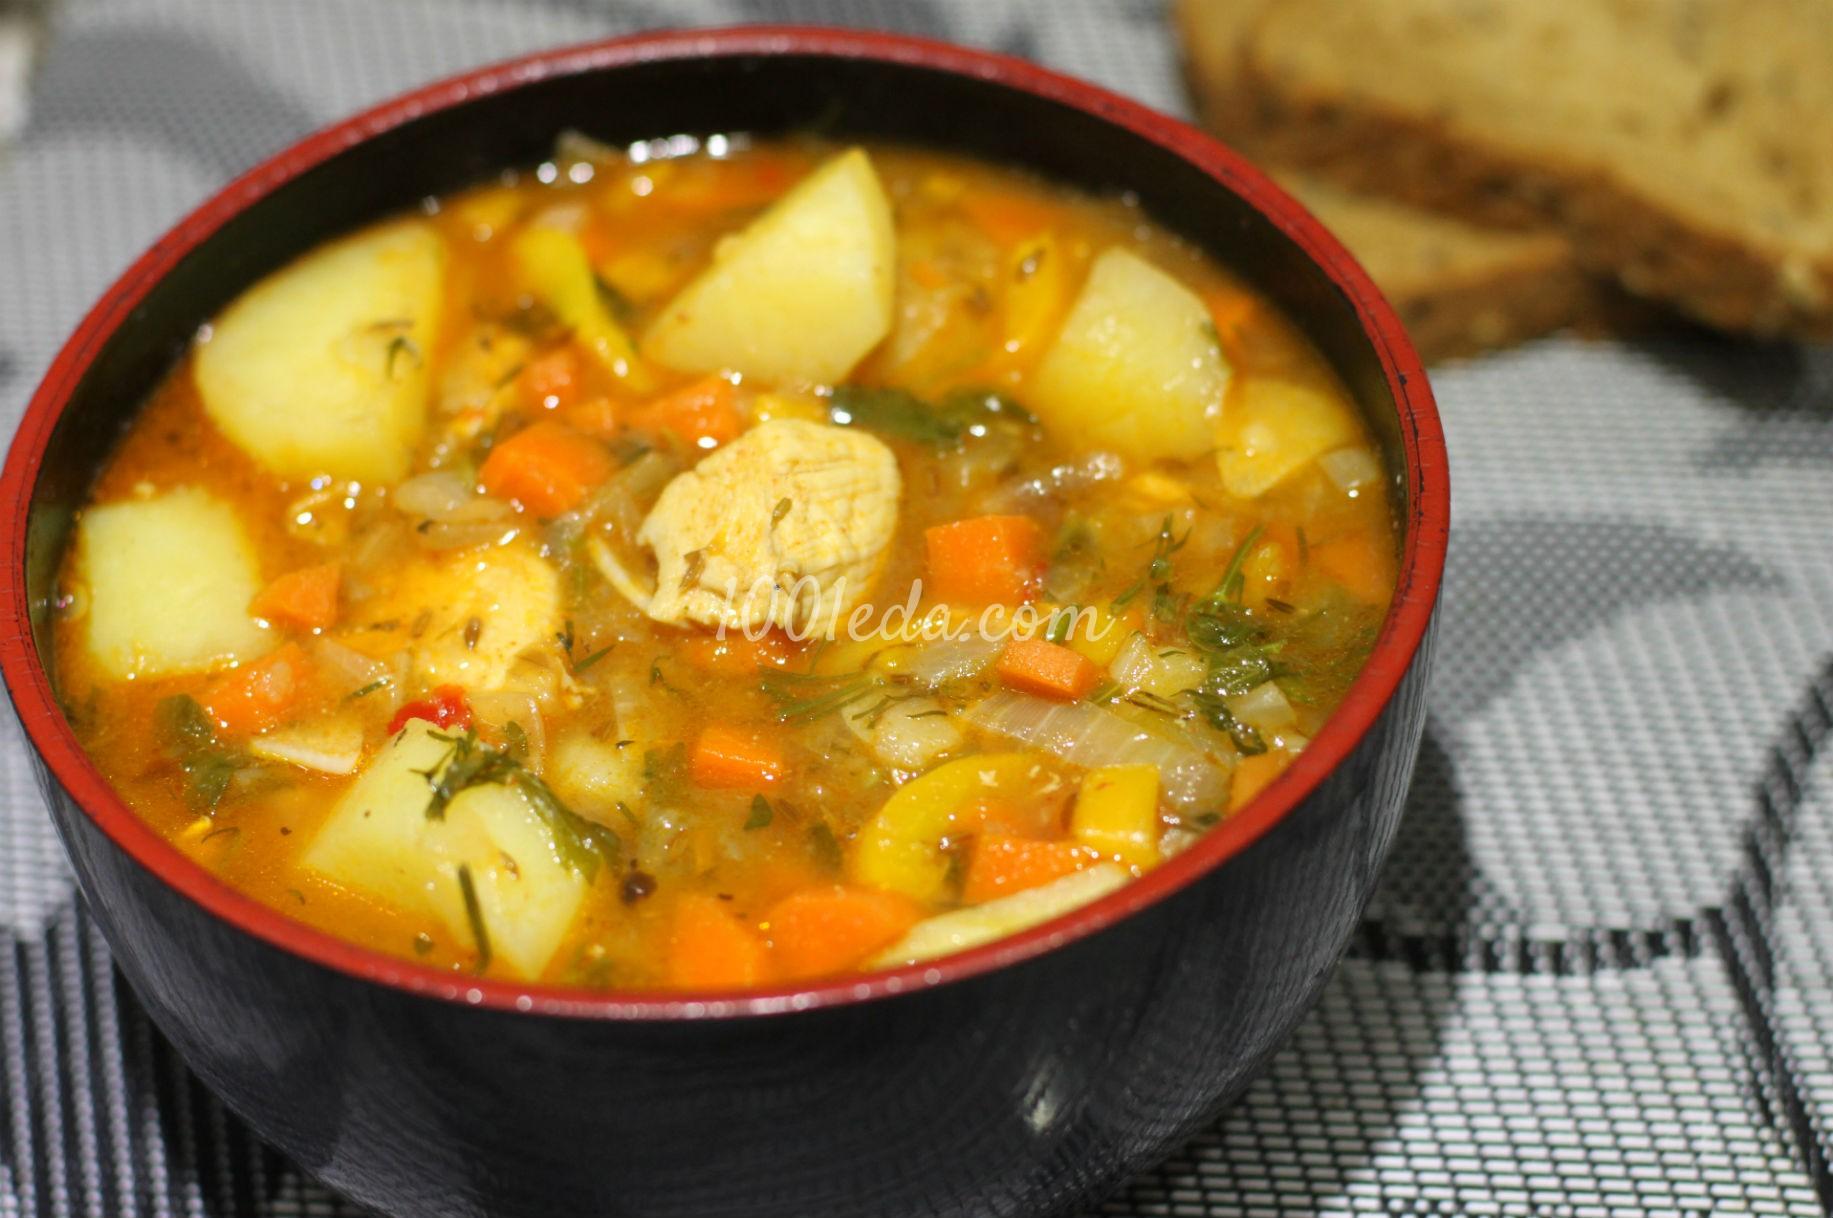 рецепт перлового супа с фото пошагово